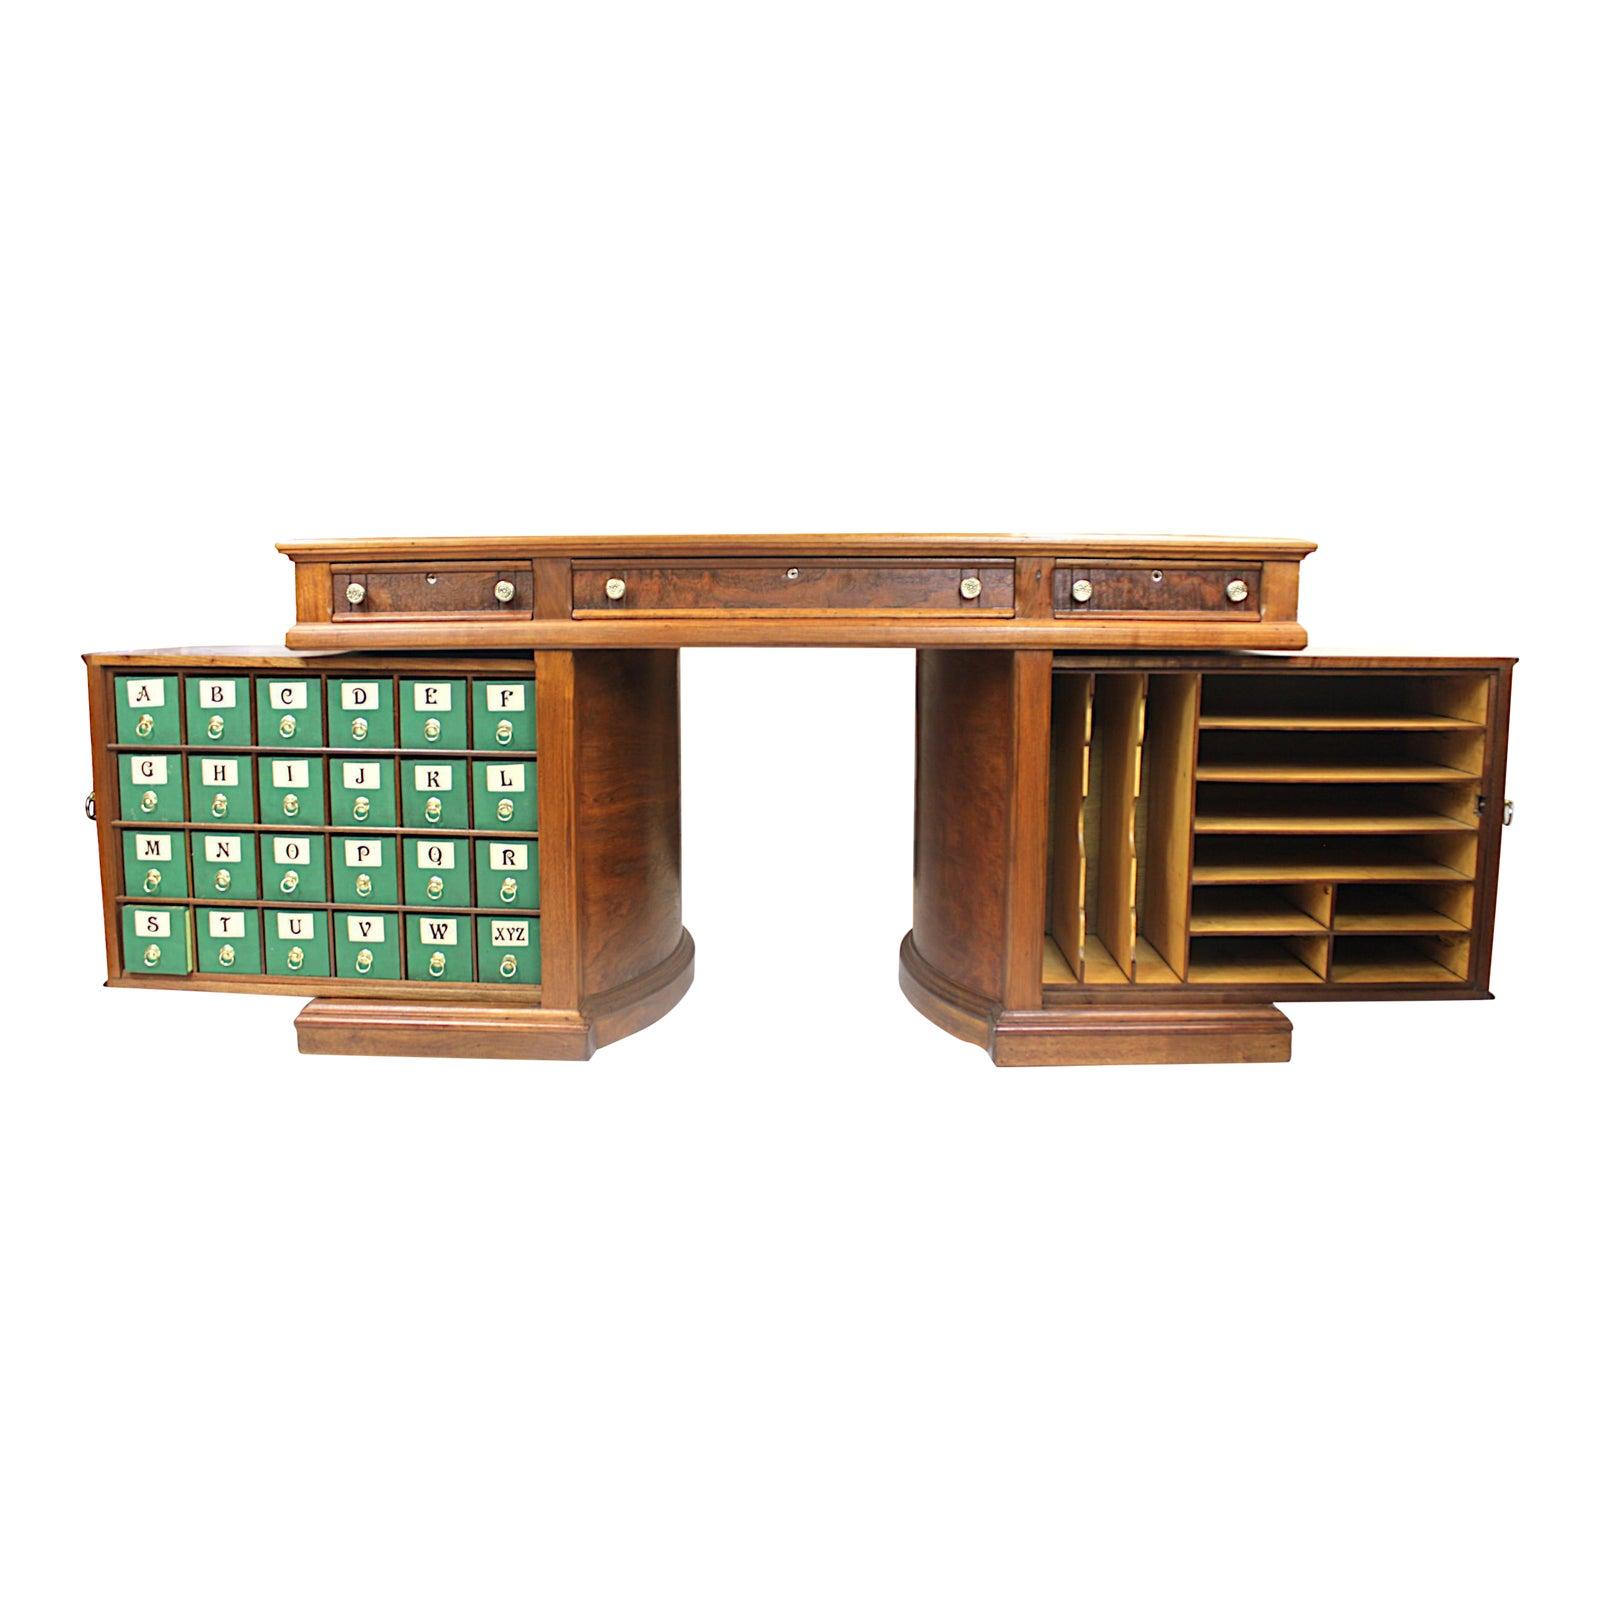 Queen Anne Desk >> Rare 1888 Queen Anne No 8 Walnut Rotary Desk By The Wooton Desk Mfg